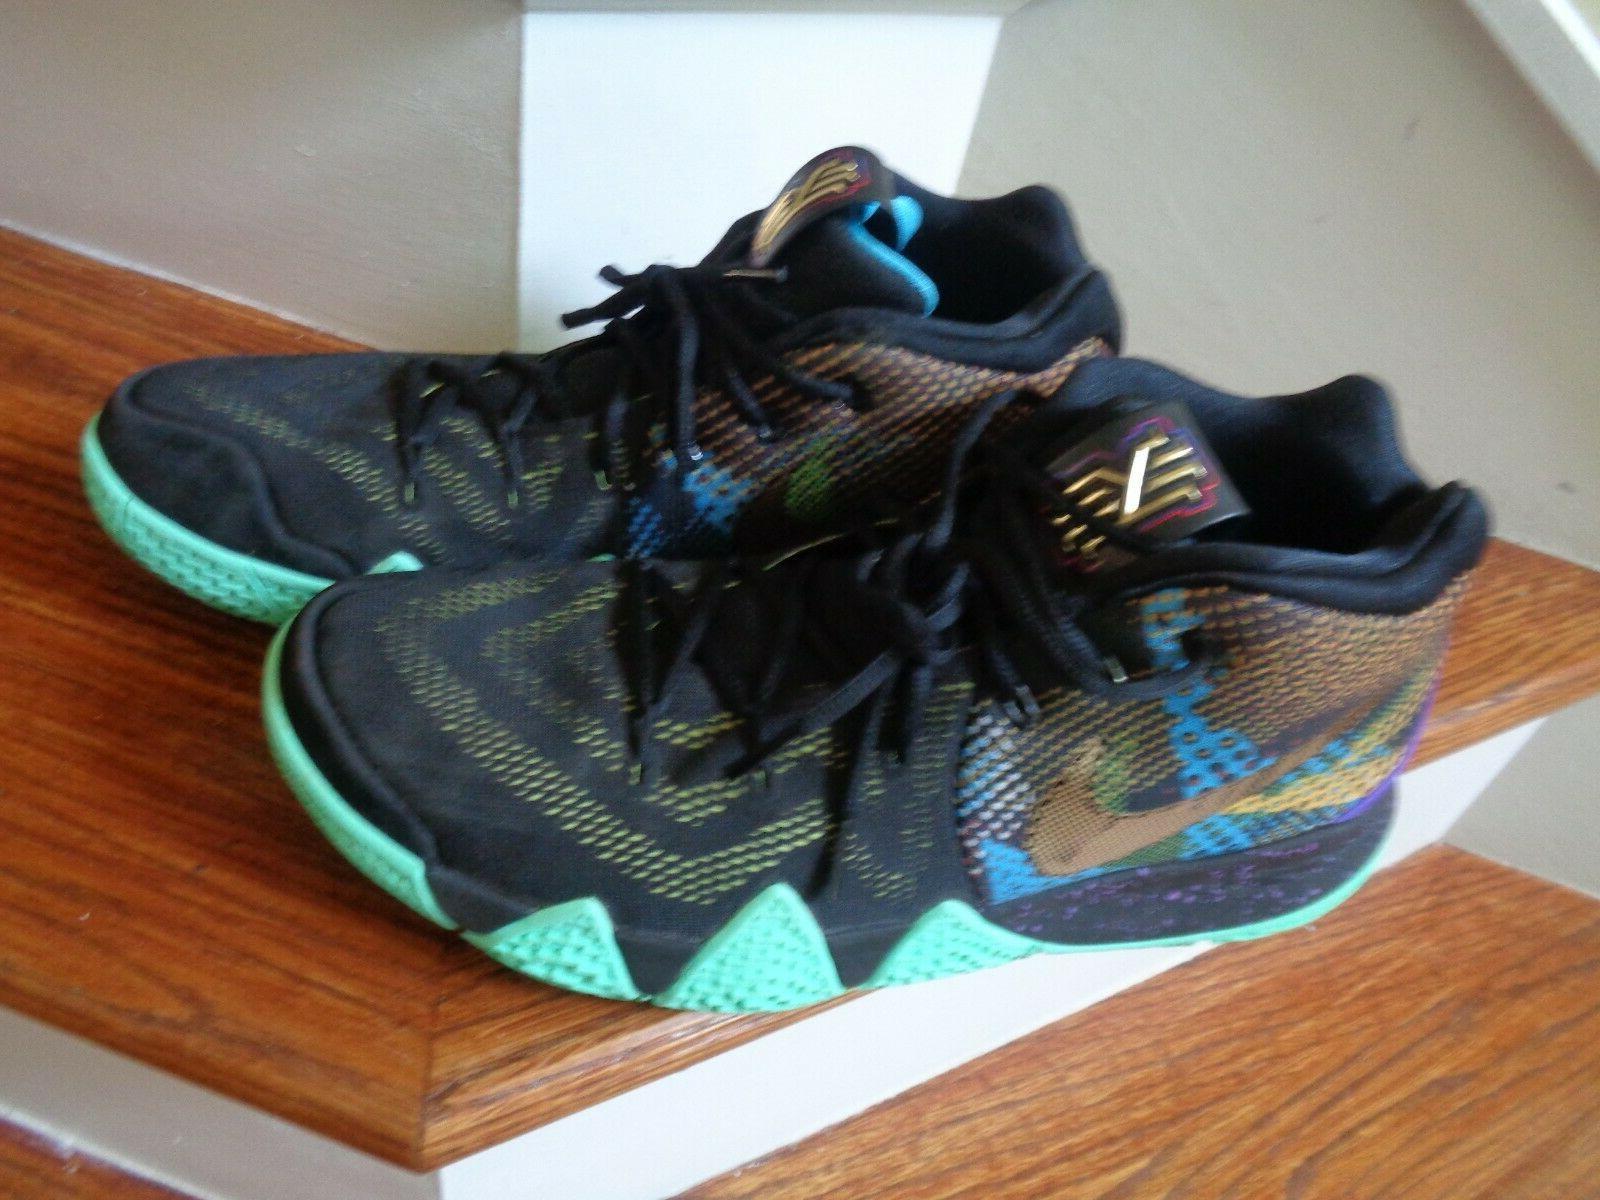 Nike Men's Shoes,